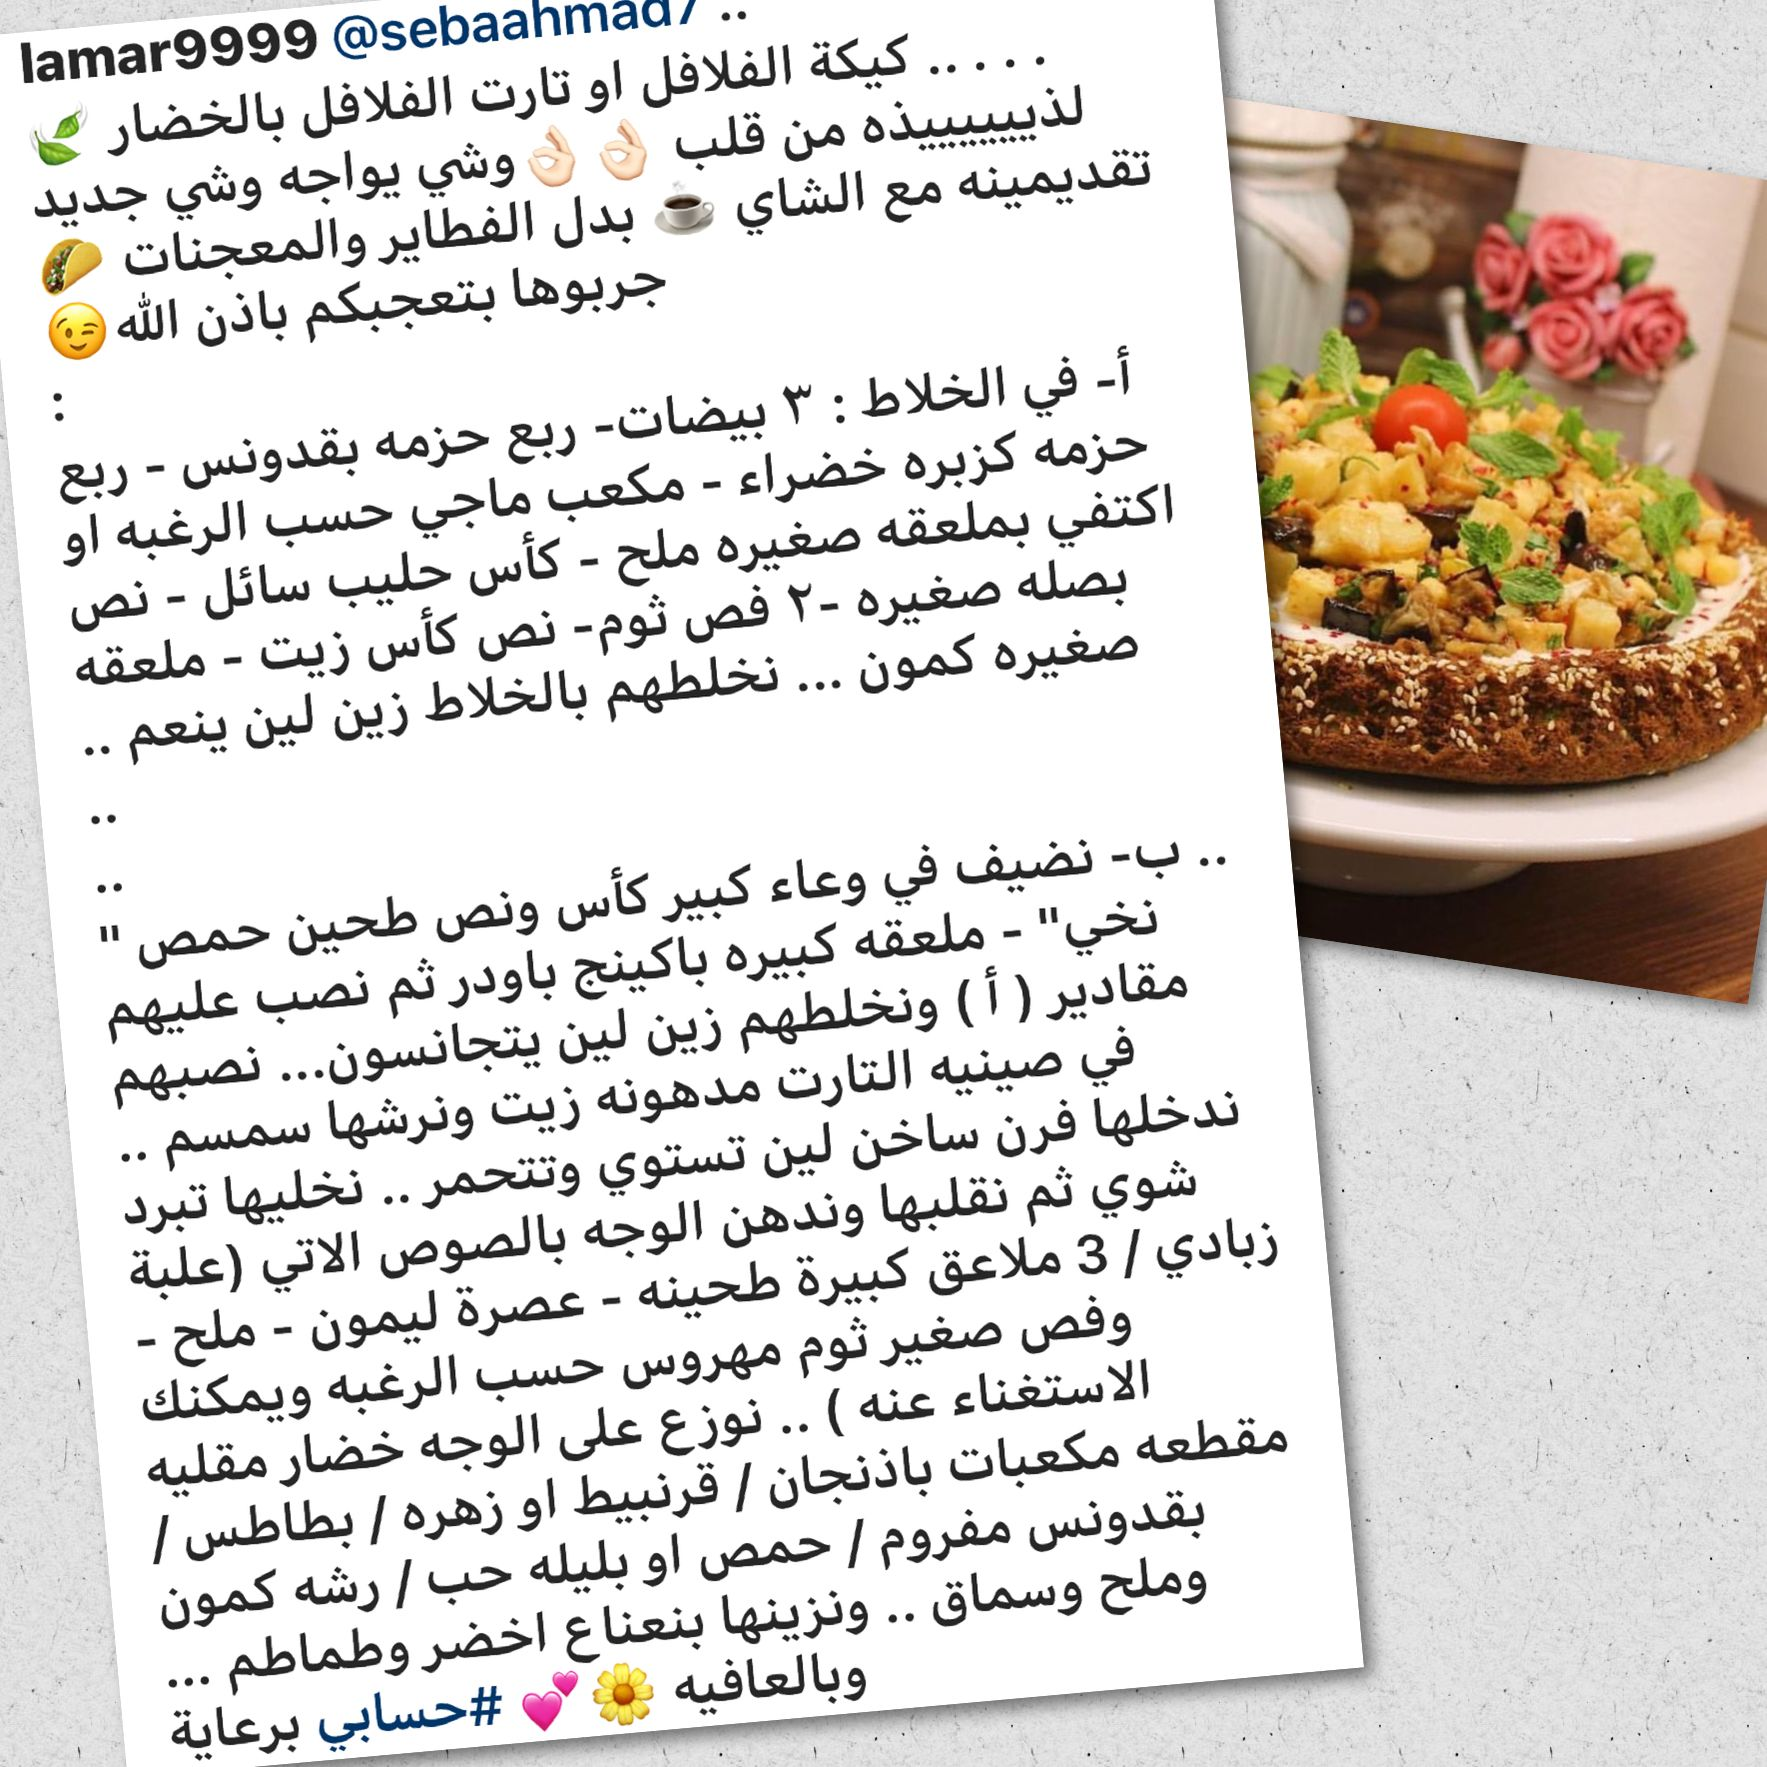 تارت الفلافل بالخضار Ramadan Recipes Food Receipes Cooking Recipes Desserts